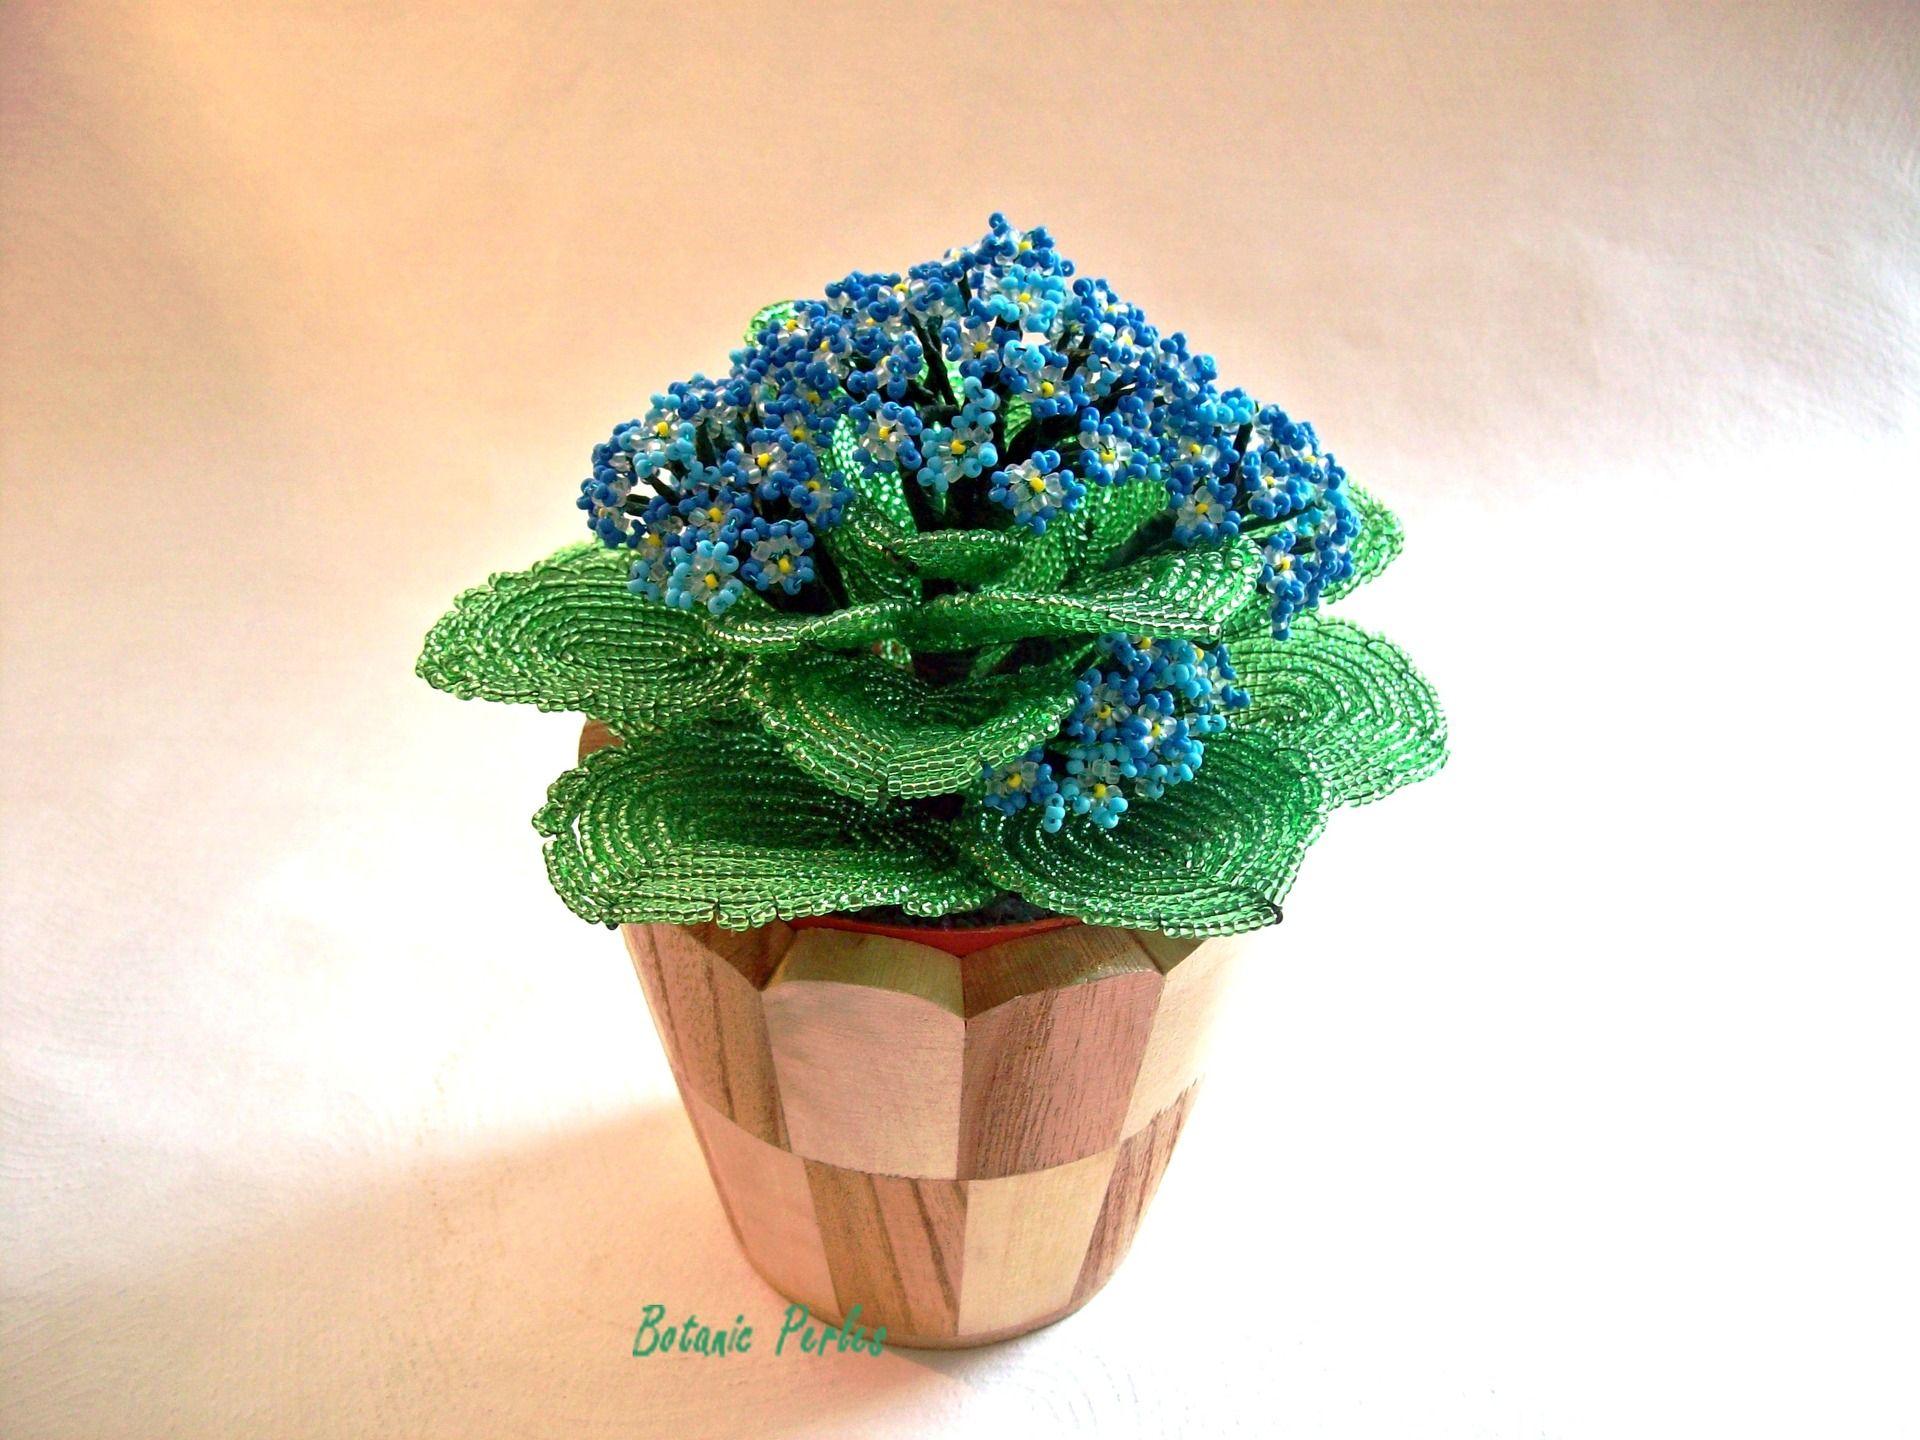 plante en perles crassulac e bleue grandeur nature cache. Black Bedroom Furniture Sets. Home Design Ideas